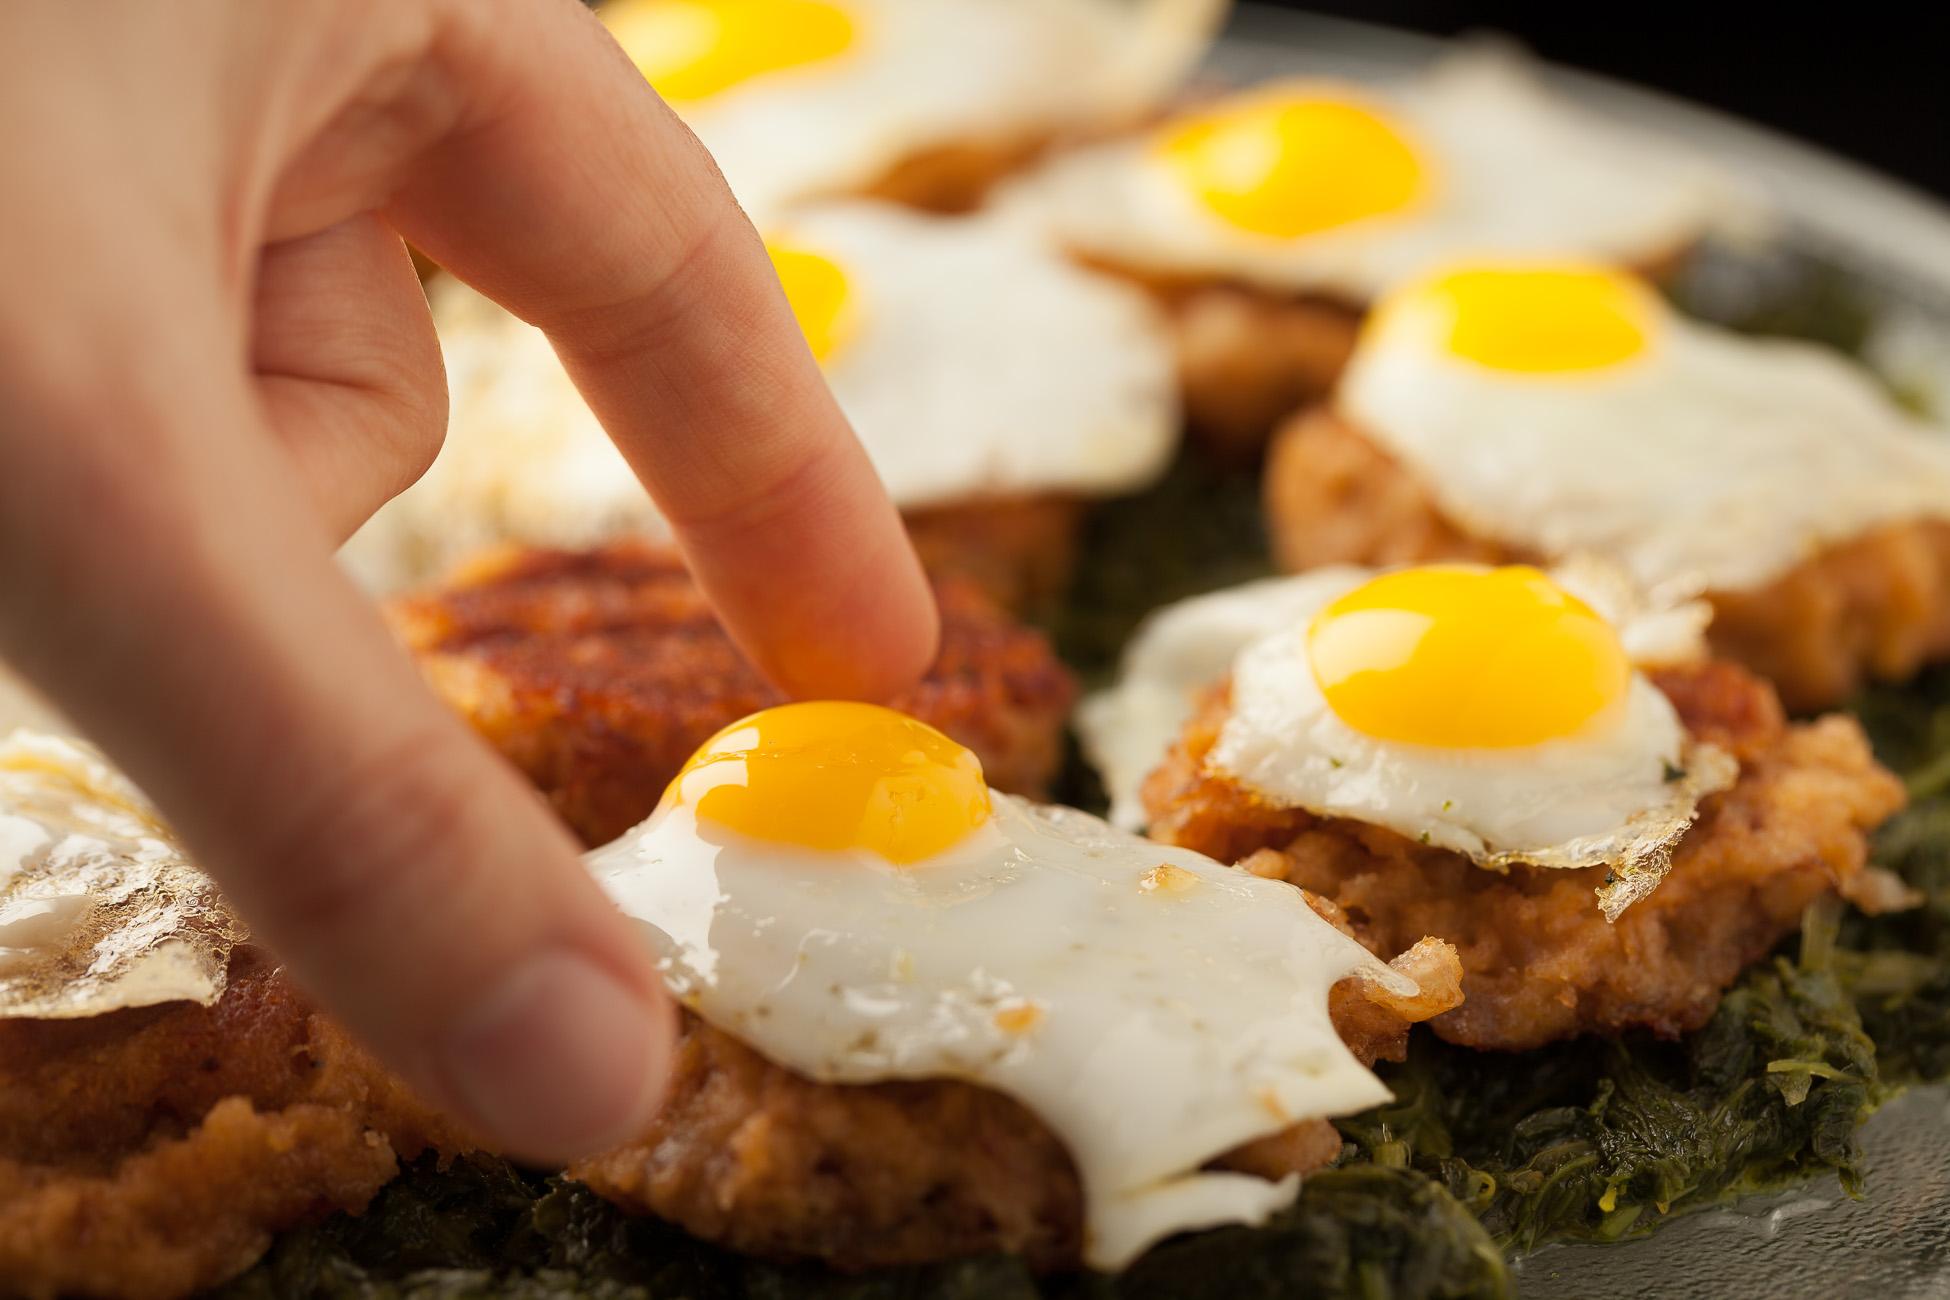 goncalo-barriga-photographer-editorial-food-lifestyle-011.jpg